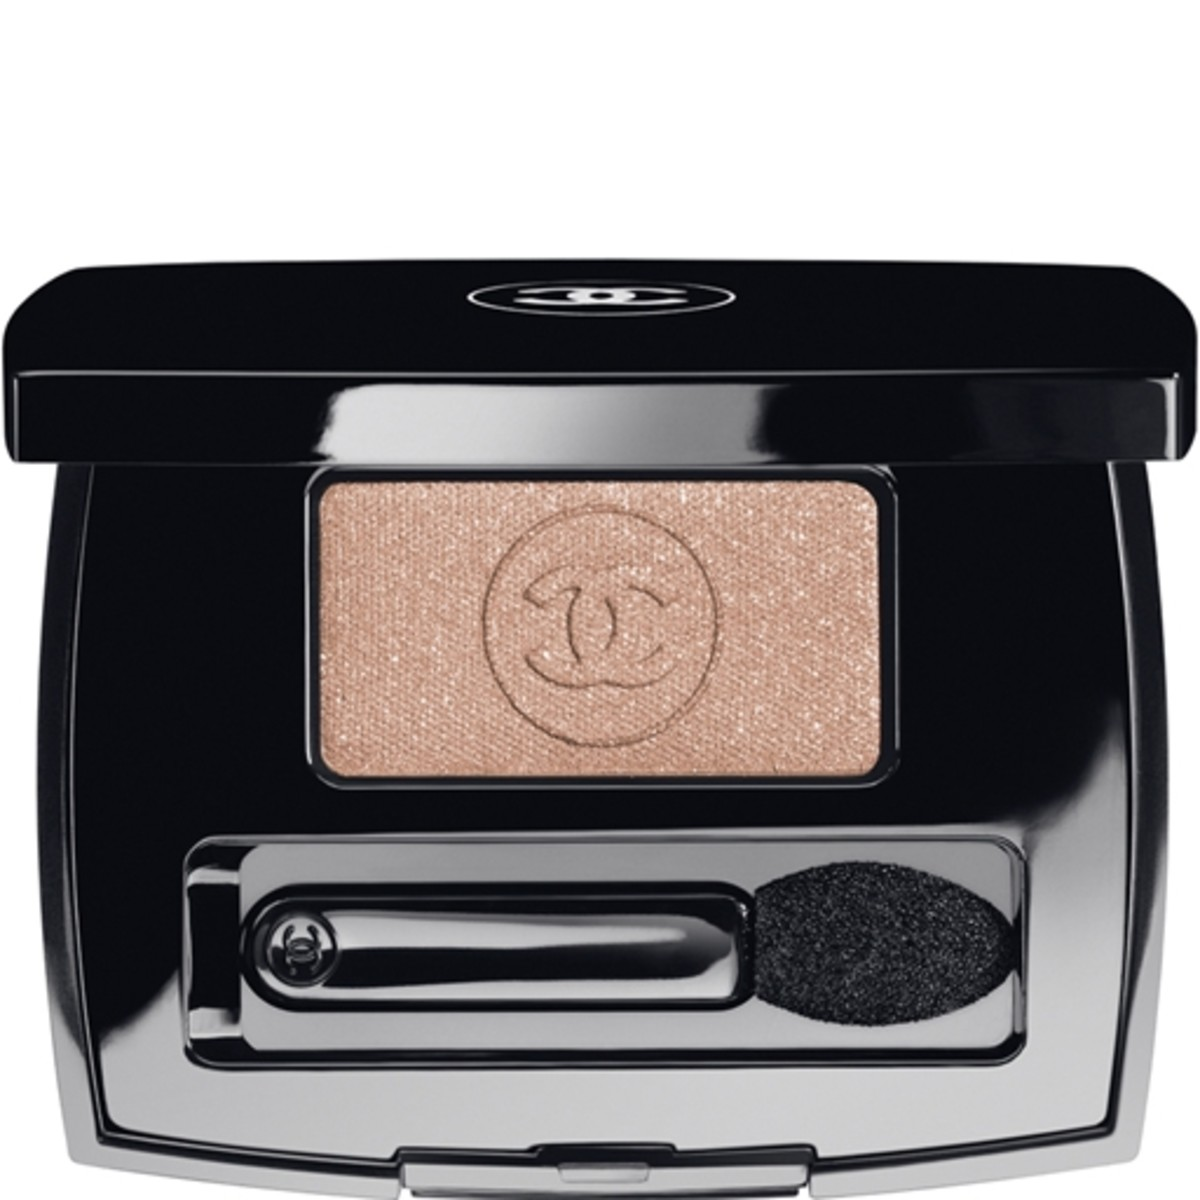 Chanel Ombre Essentielle Soft Touch Eyeshadow in 45 Safari